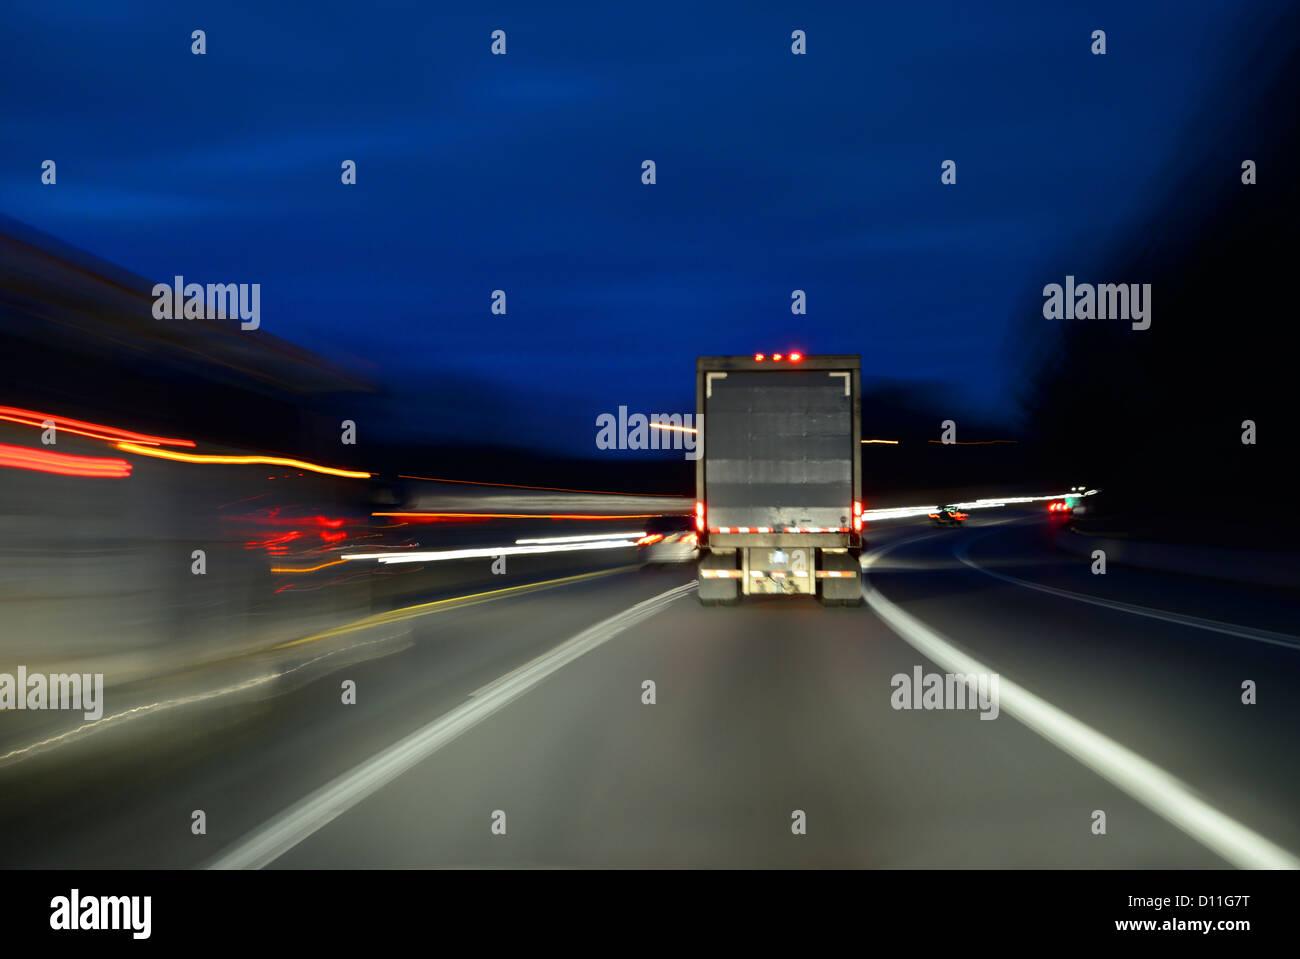 Truck Lorry Speeding On Highway At Night, USA - Stock Image